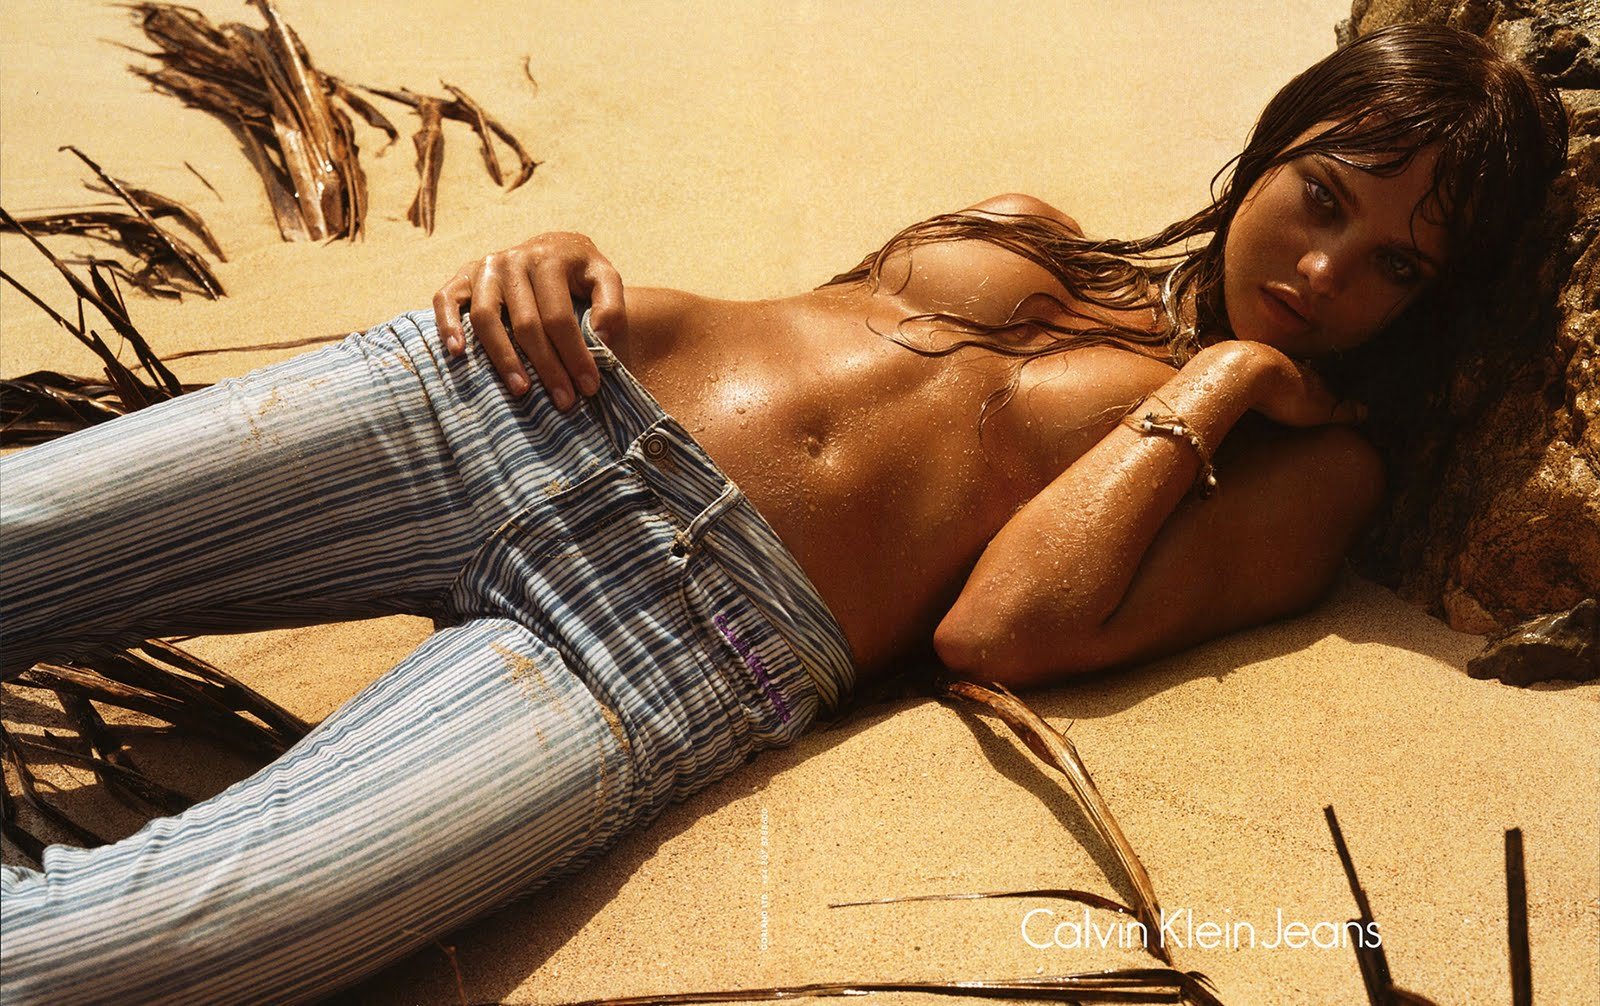 http://1.bp.blogspot.com/_duAuTt2KJgk/TLOohlXNOiI/AAAAAAAAAkw/8u7GR7q-BtA/s1600/Russian-Women-Natalia-Vodianova.jpg